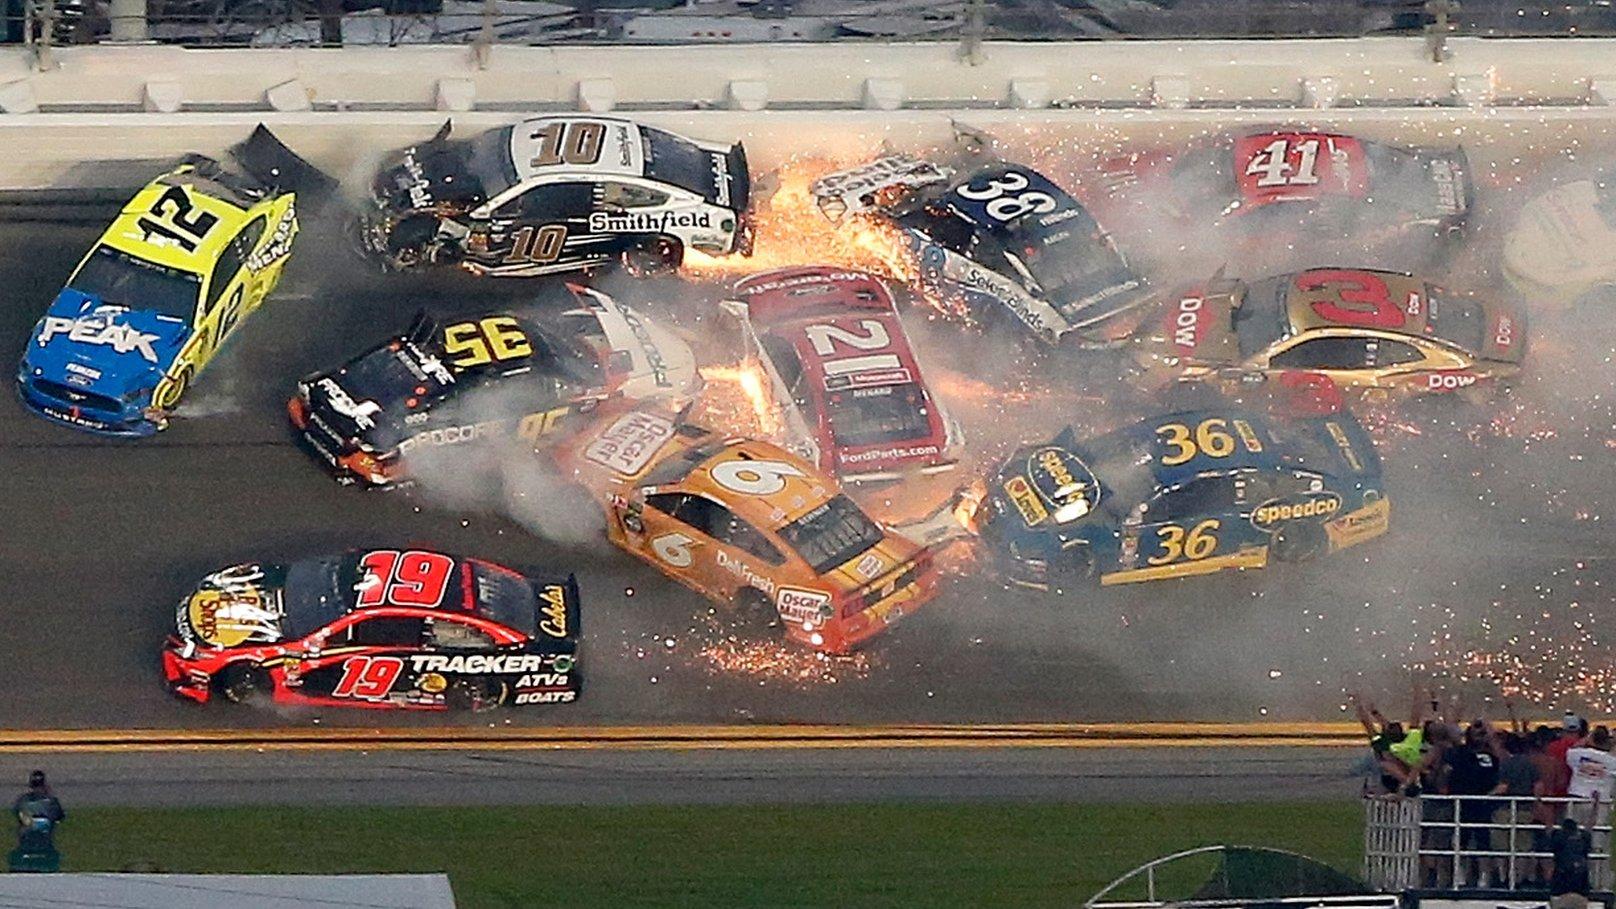 Daytona 500: Crash damages 18 cars as Denny Hamlin wins Nascar showpiece